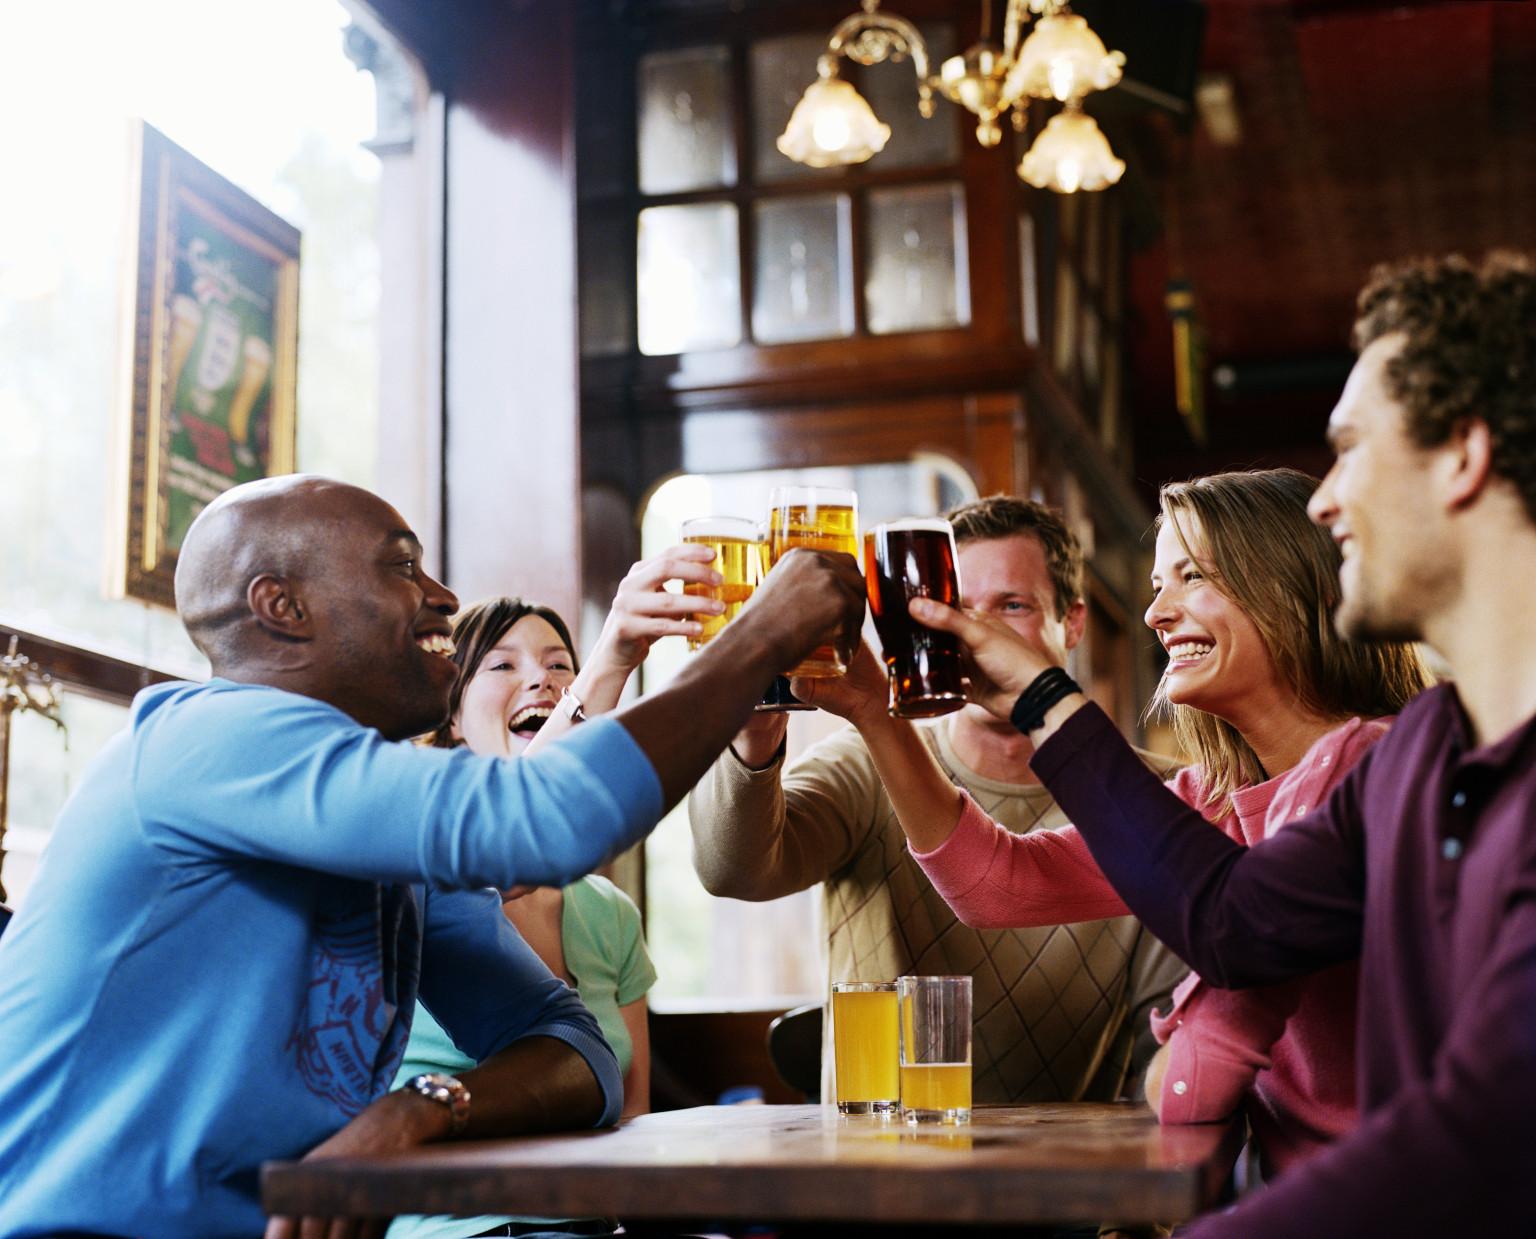 Happy hour at a bar- representative image